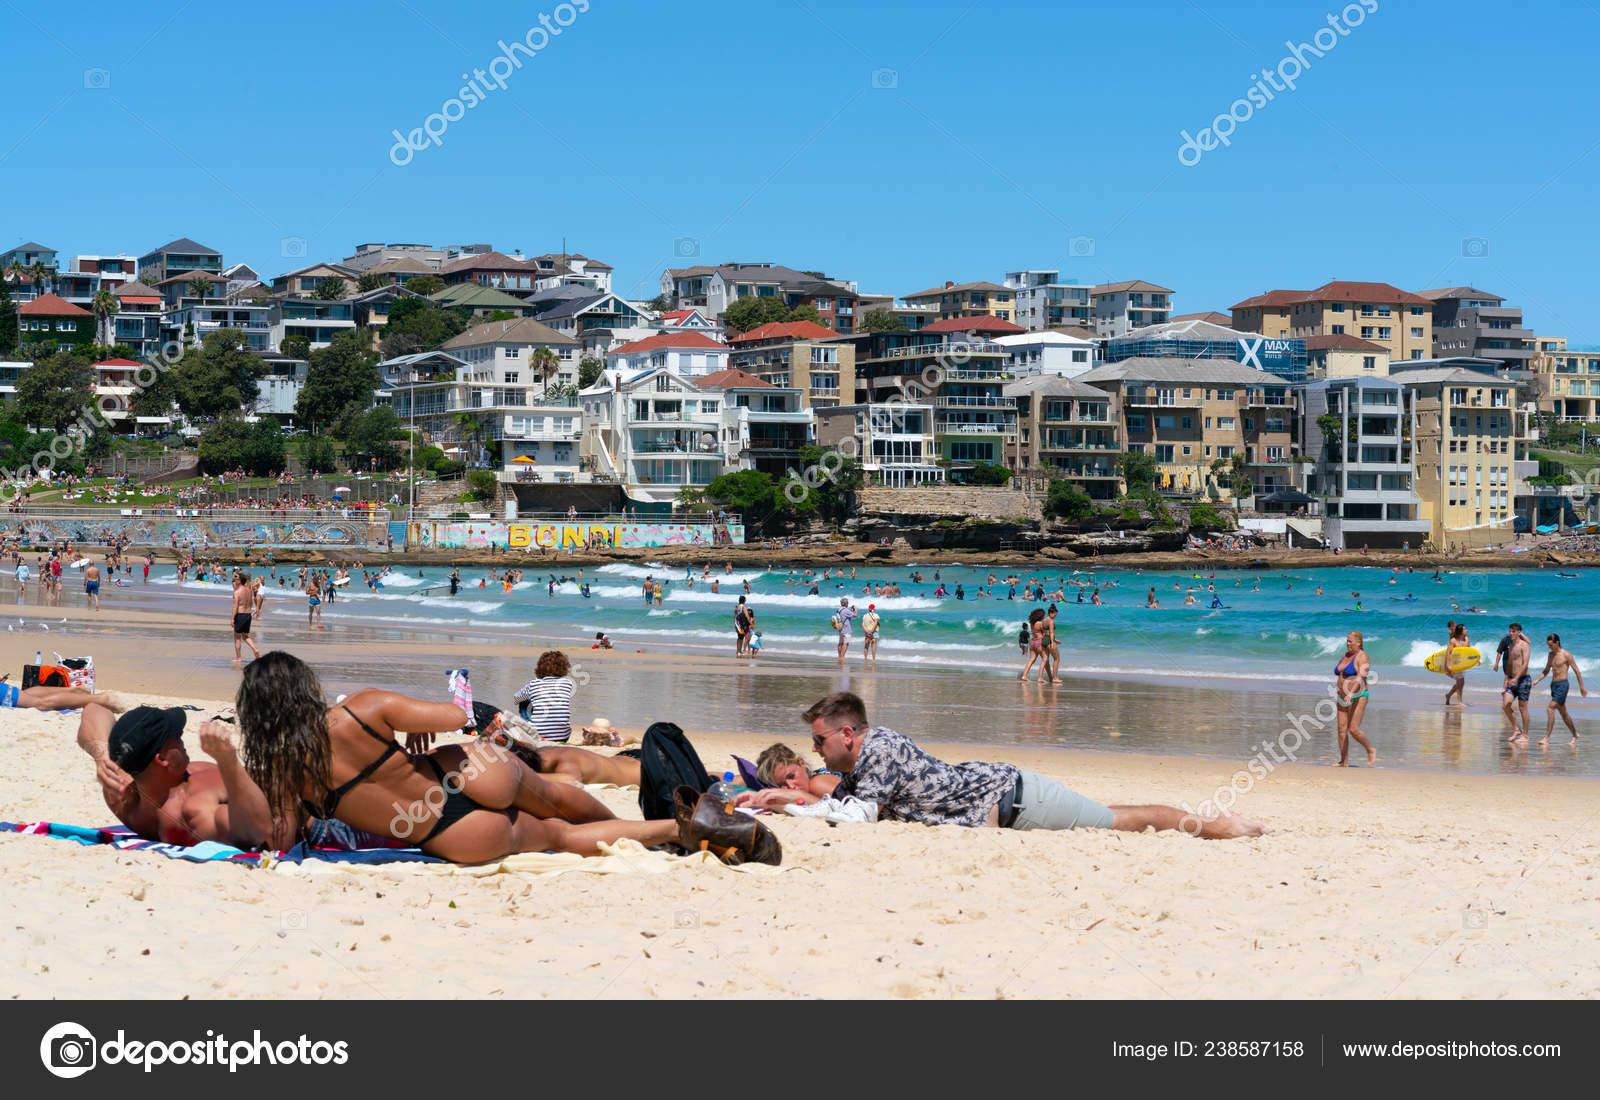 Photos Bondi Beach Bikini 24th December 2018 Bondi Sydney Australia Woman Wearing Thong String Stock Editorial Photo C Keitma 238587158